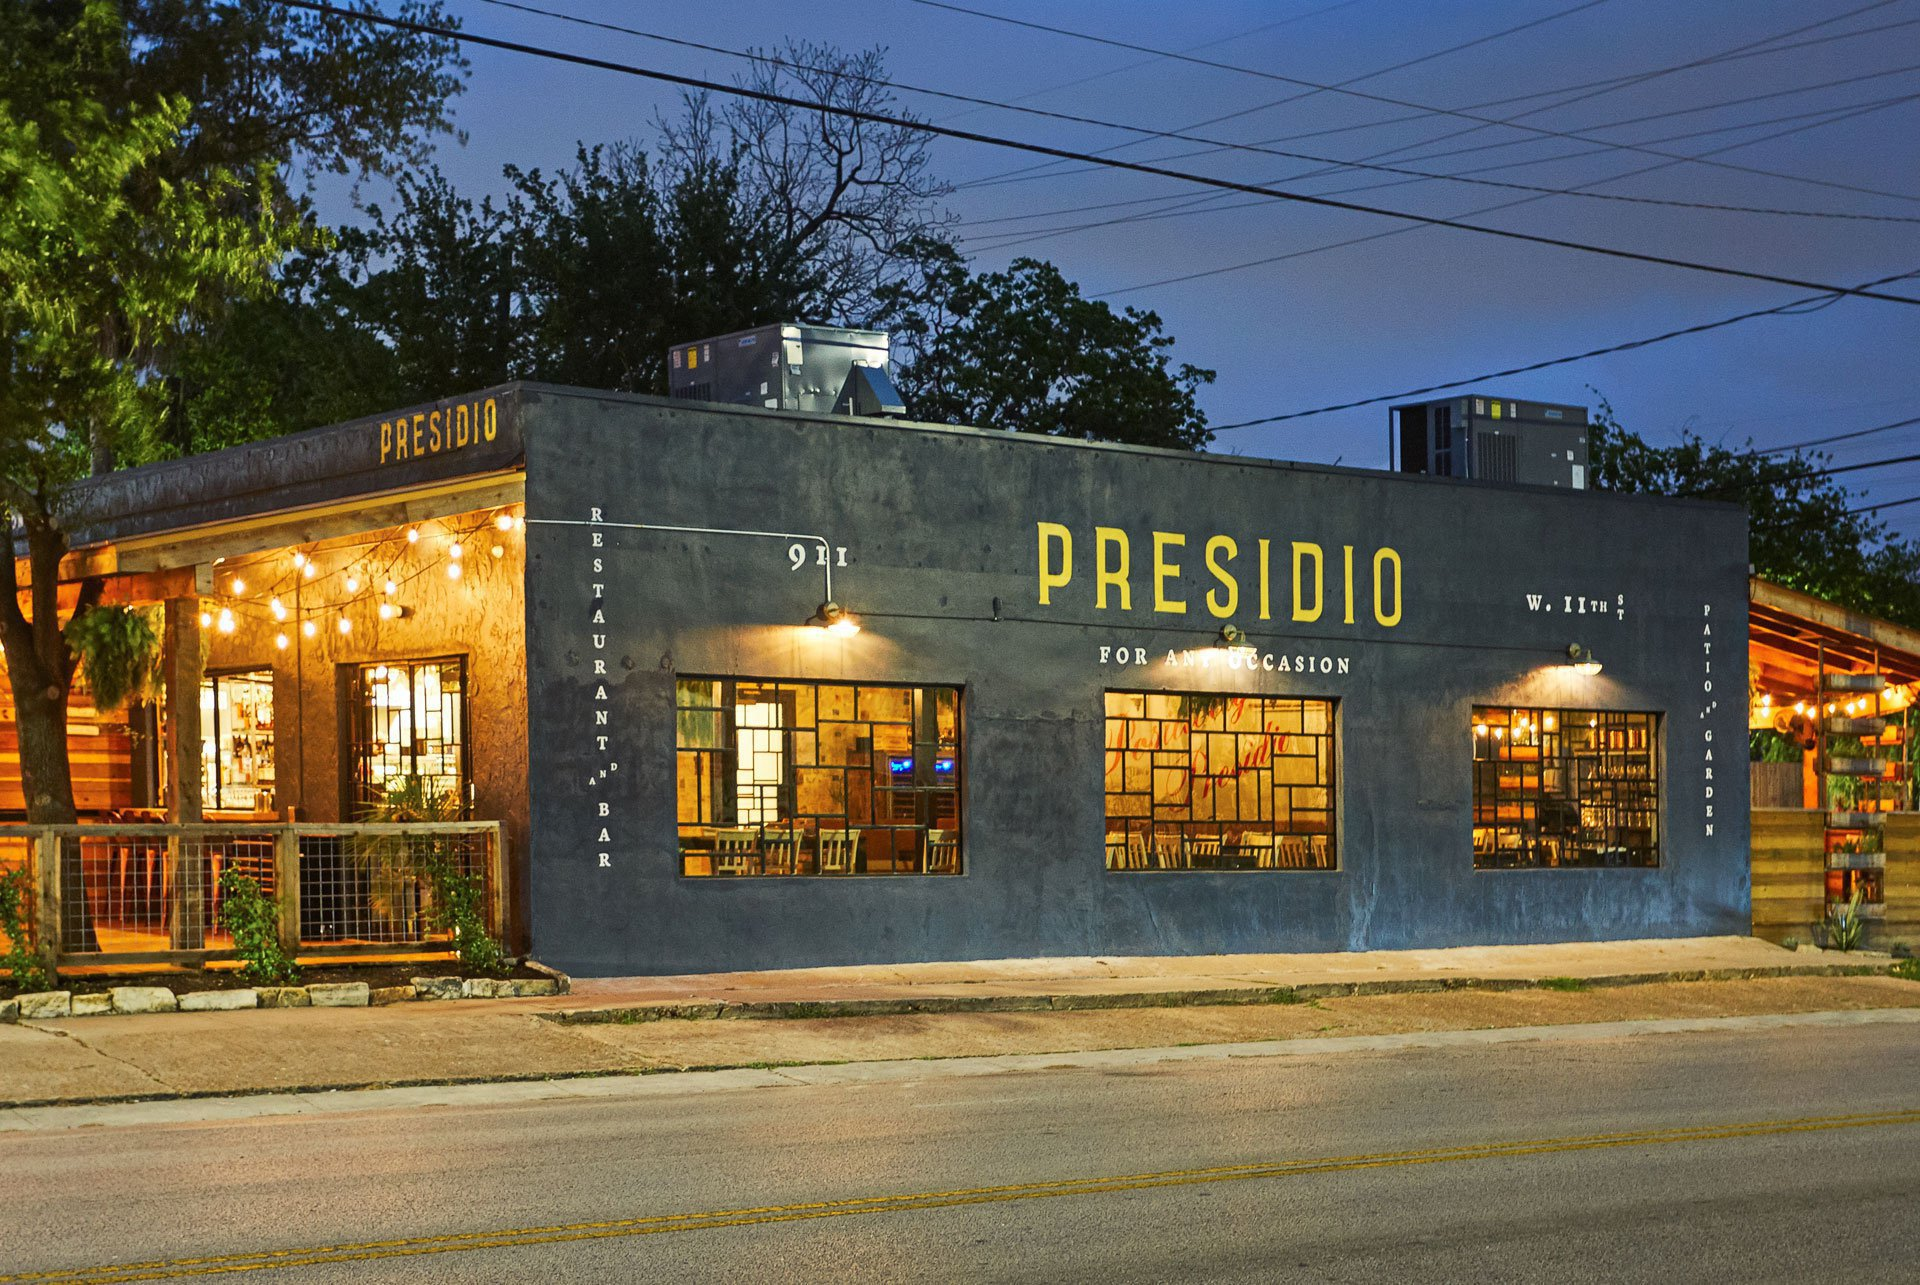 Presidio Restaurant & Bar